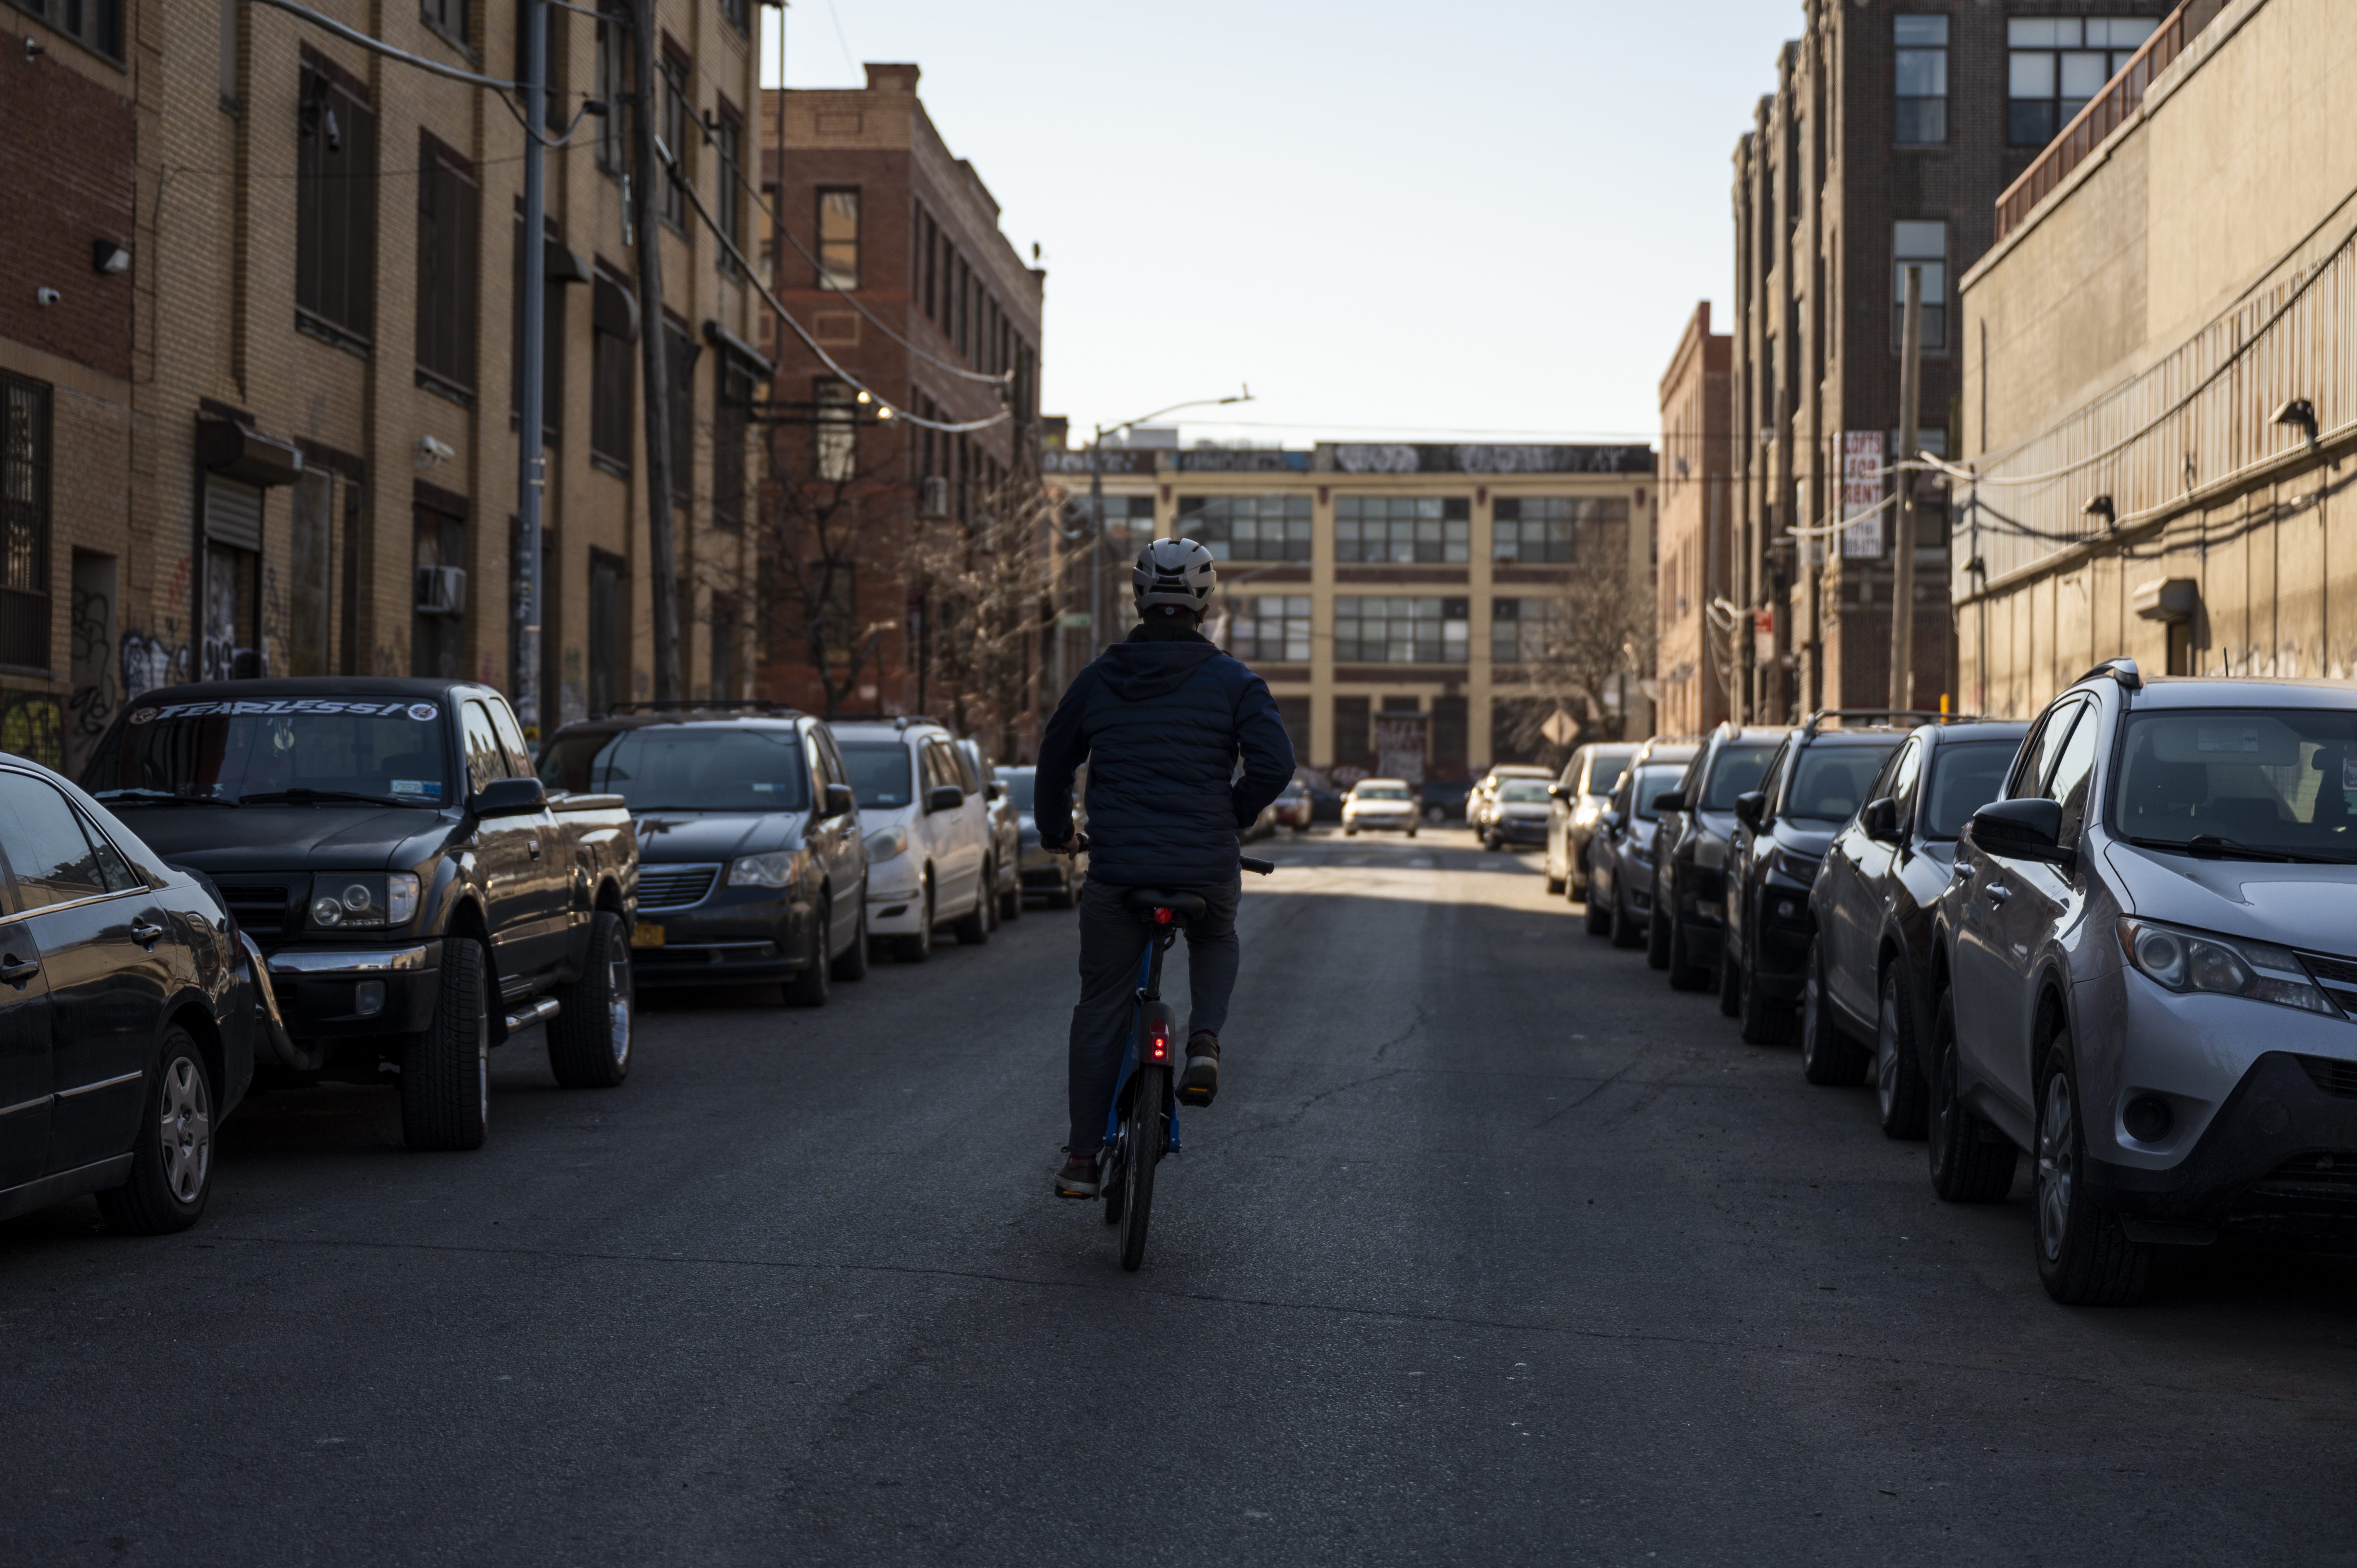 Edgardo Rivera bikes down a street in Bushwick. Feb. 26, 2021.